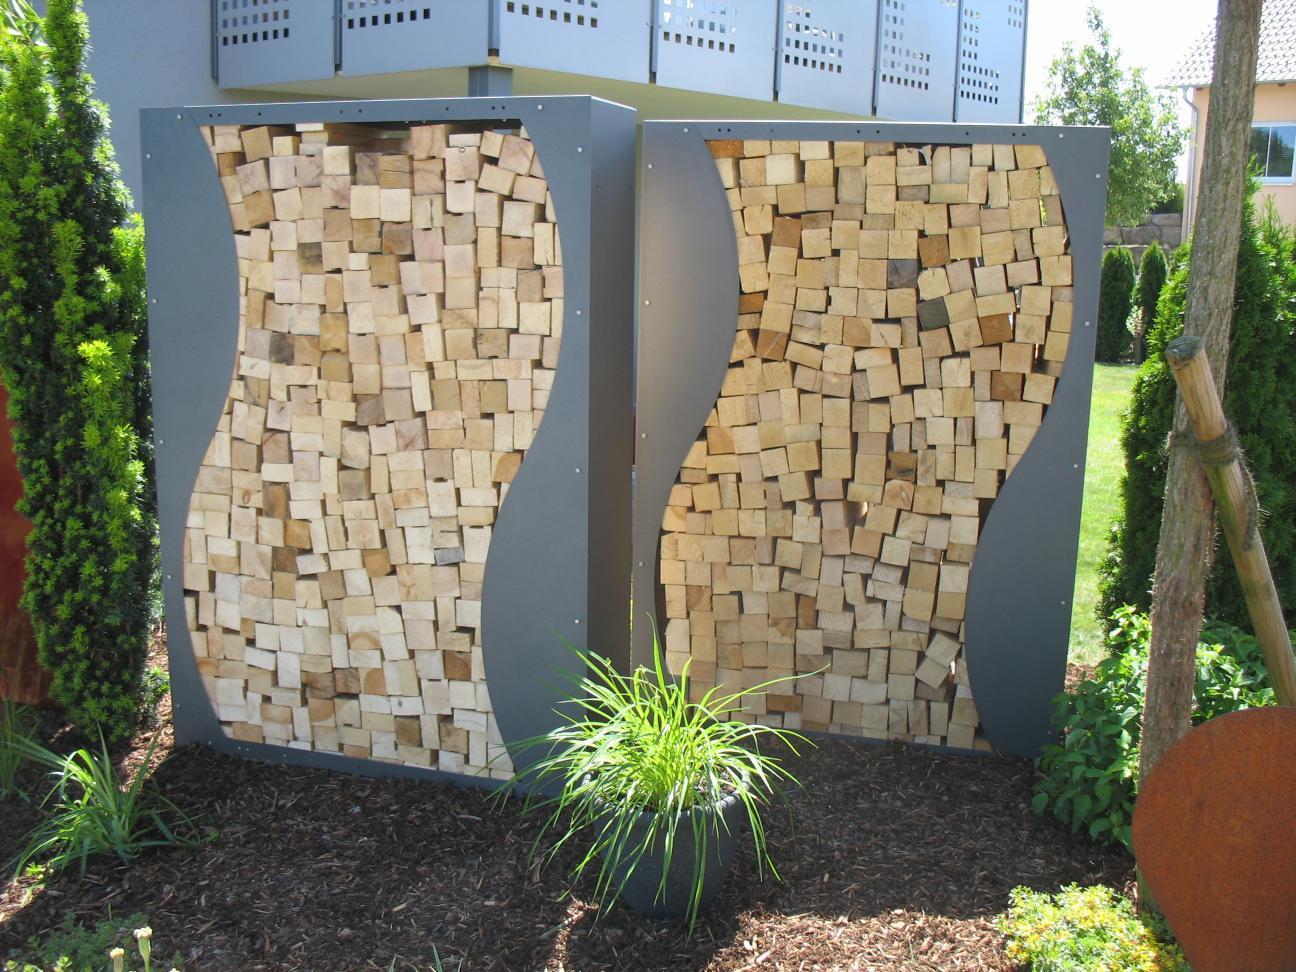 kaminholzregal au en mit r ckwand kaminholzunterstand 130x70x203cm kaminholz regal kamin. Black Bedroom Furniture Sets. Home Design Ideas